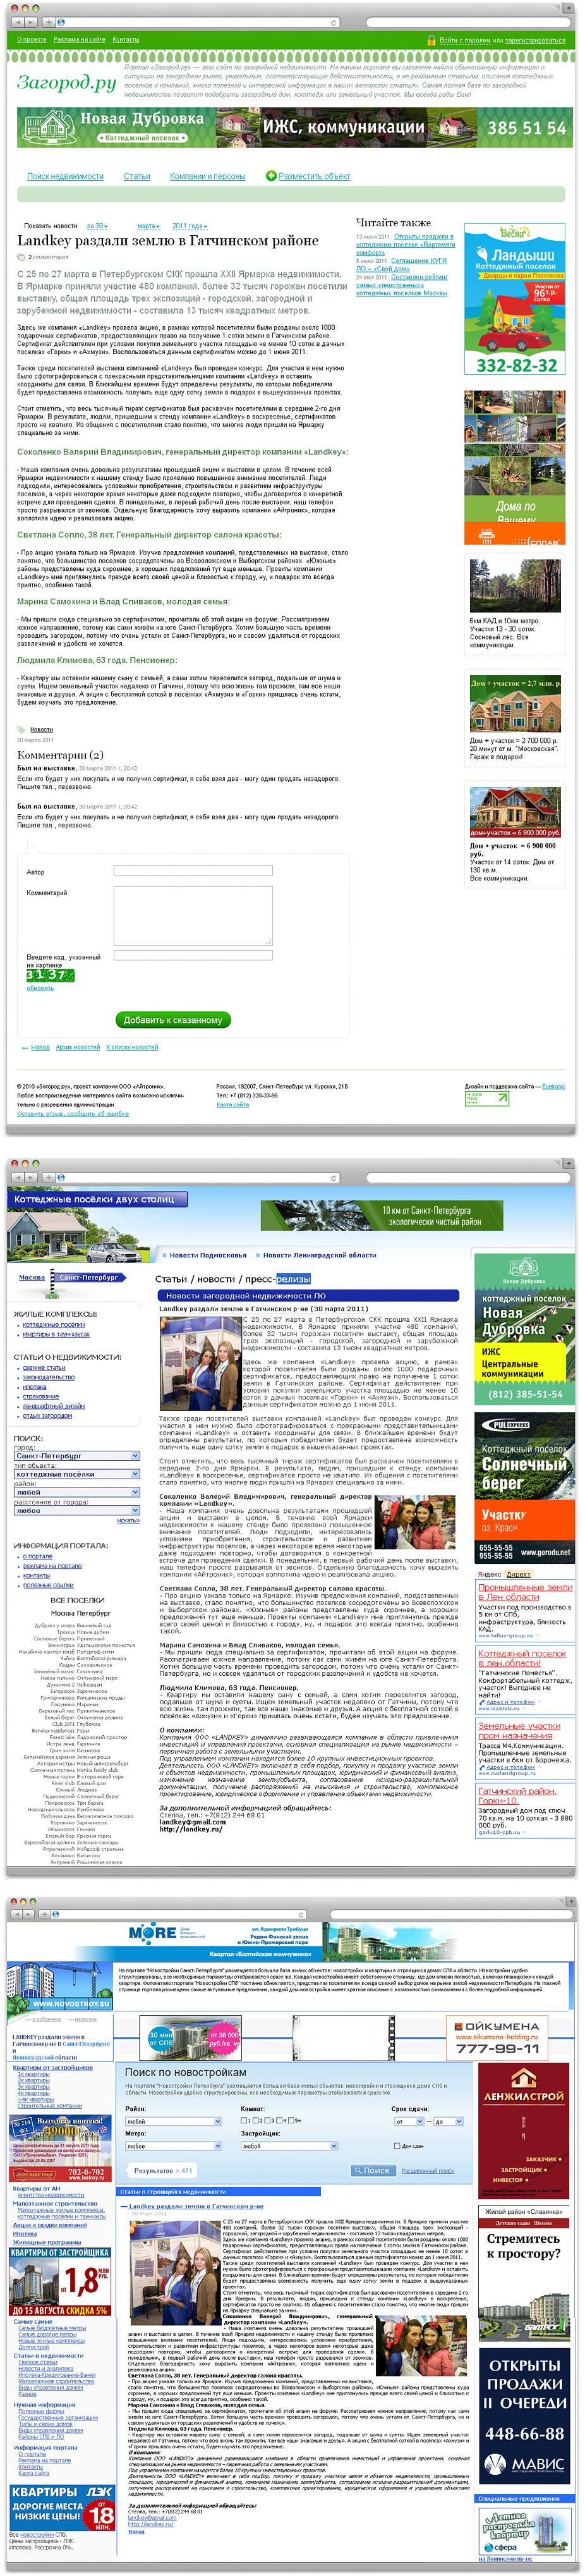 Разработка промо акции «Дарим землю!» для «Landkey» - 5